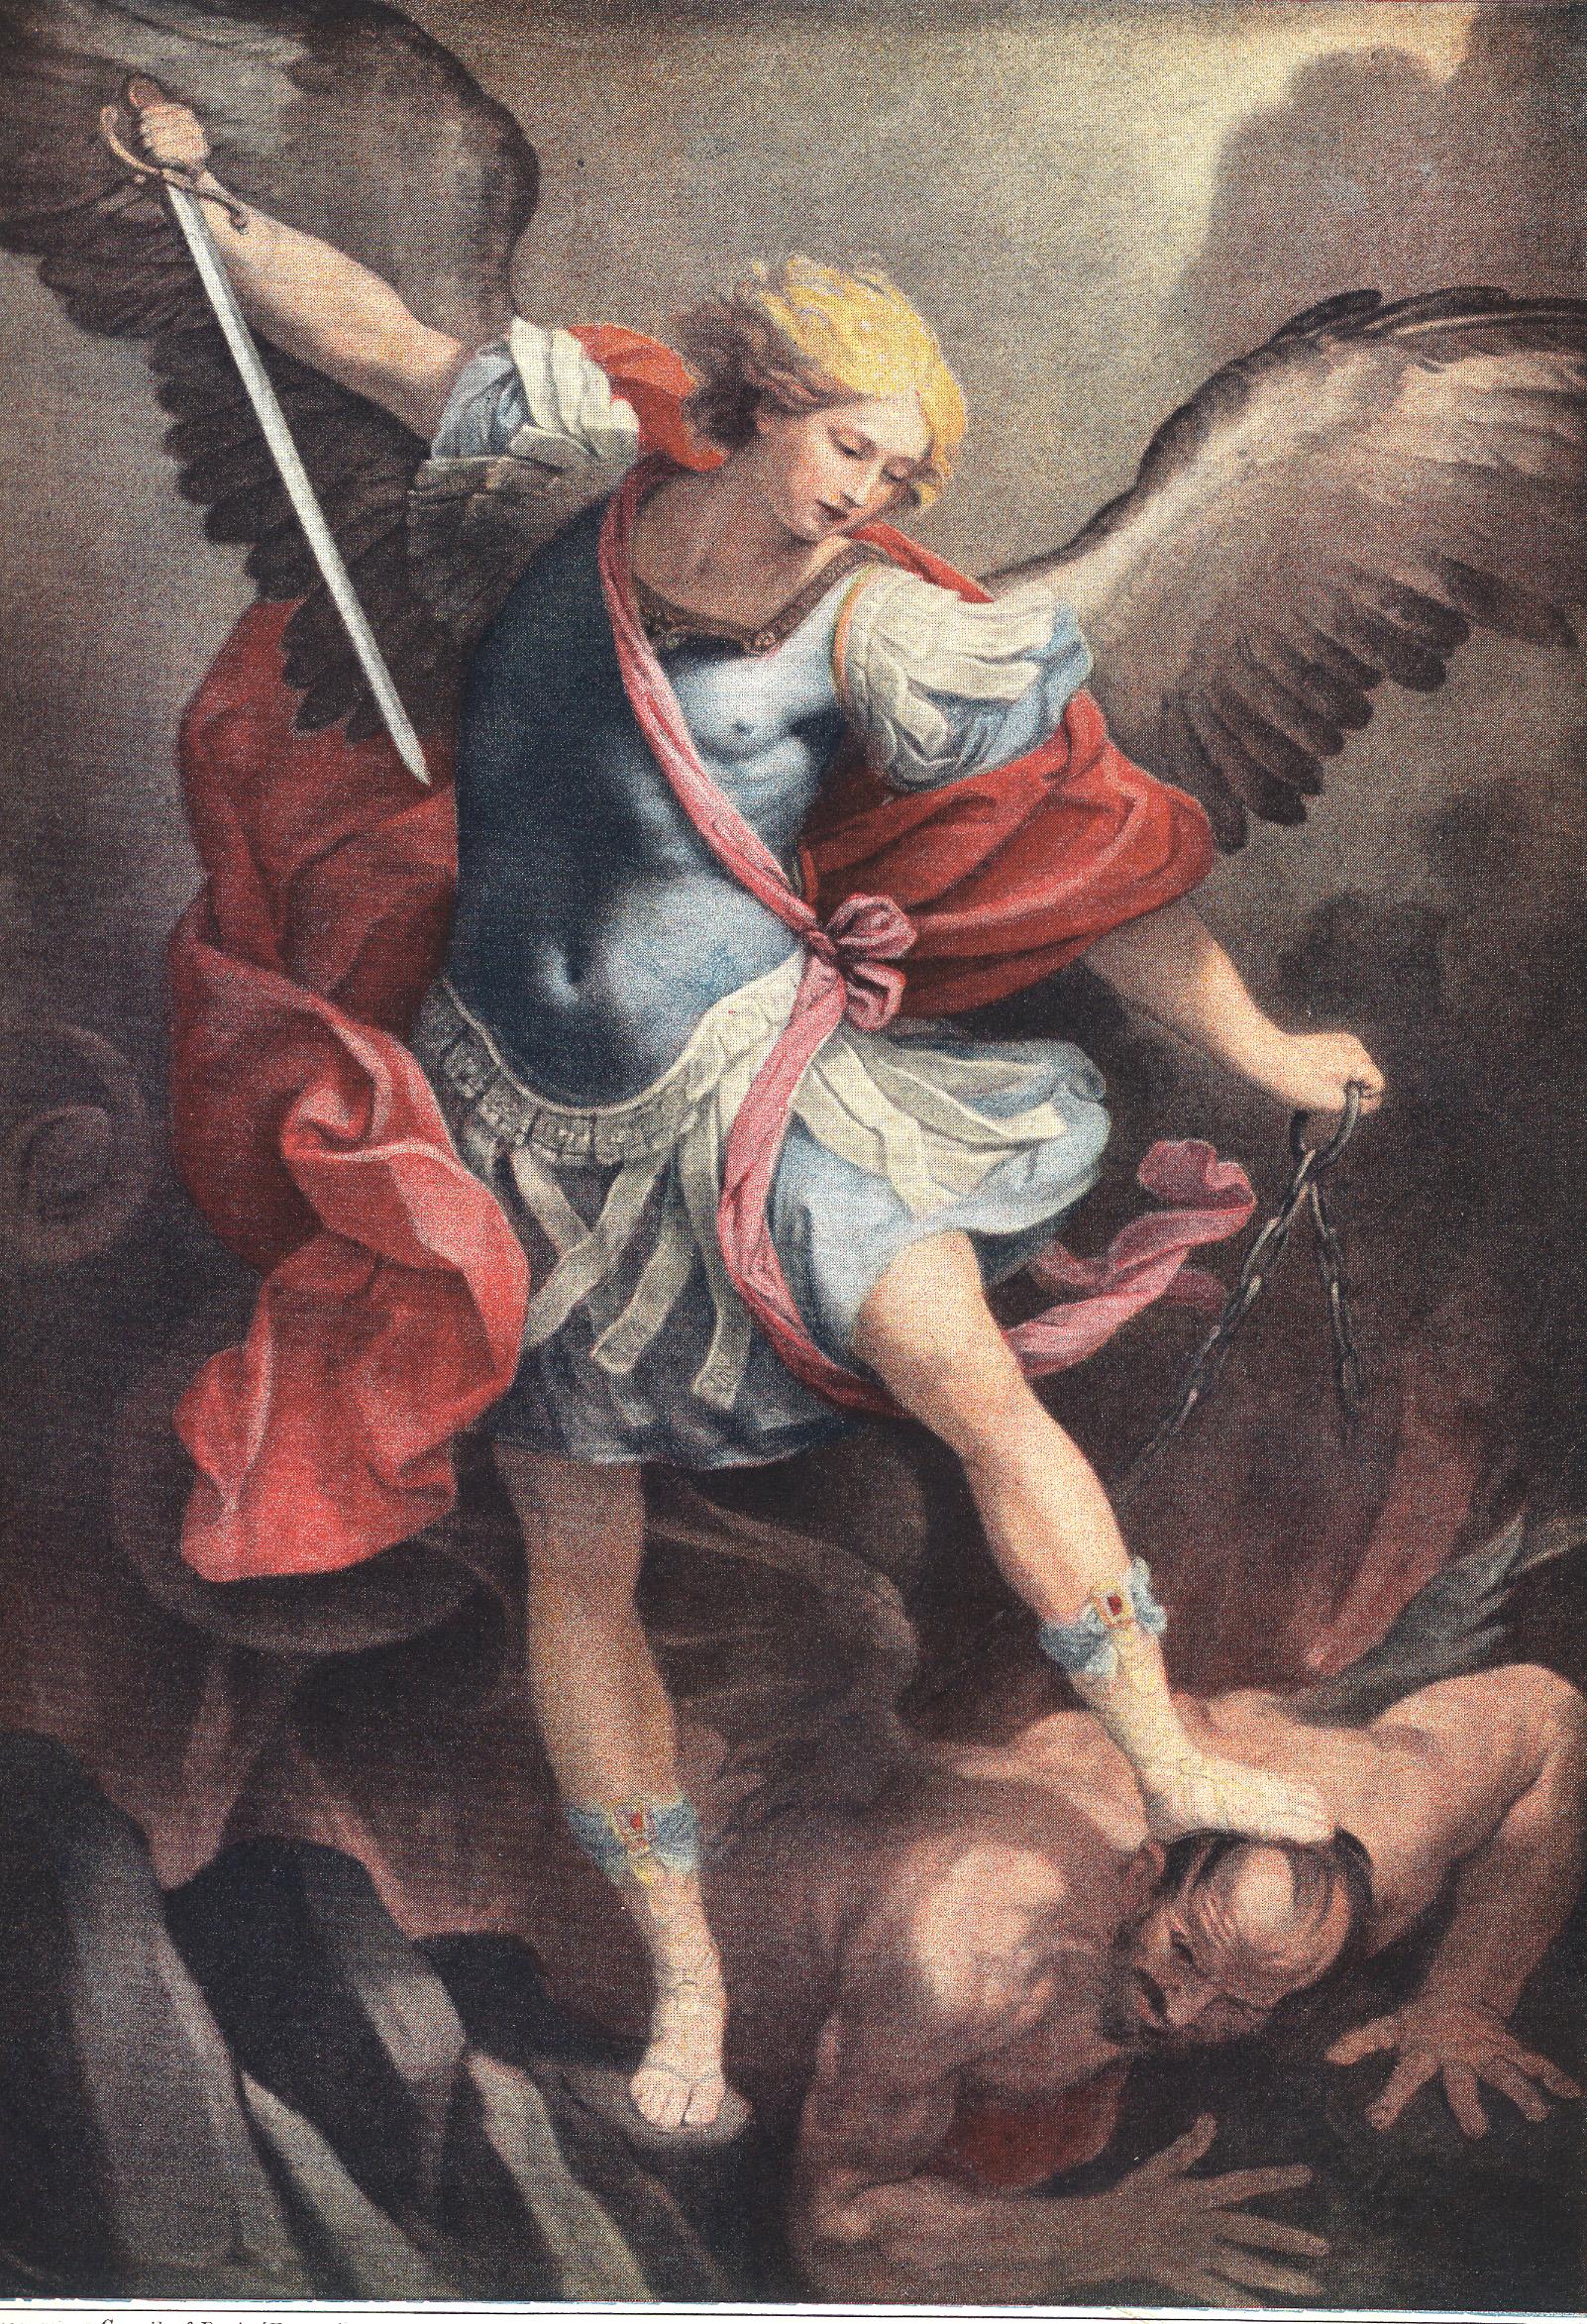 saint michael The chaplet of st michael the archangel pat megbuniwe loading  st michael archangel & story of lucifer's fall - st michael prayer - duration: 50:06.